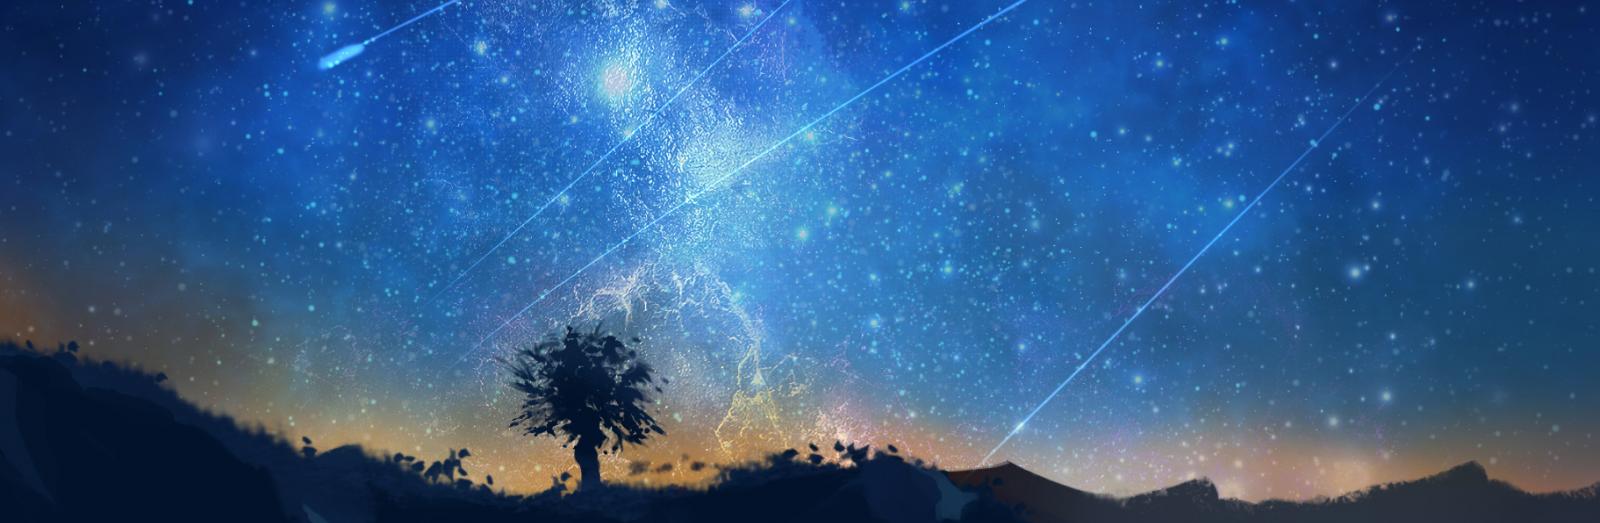 falling-stars-landscape.png